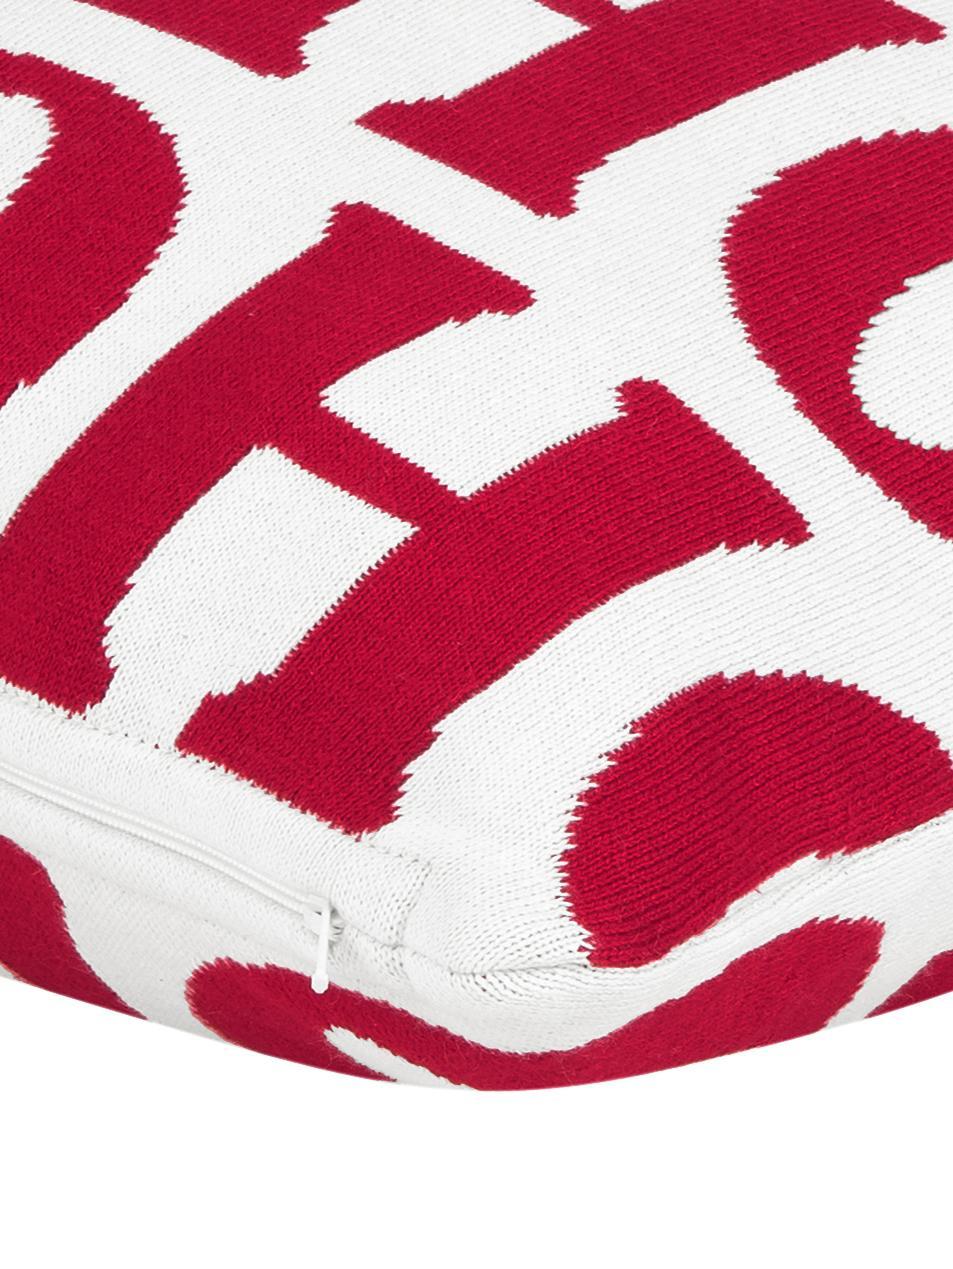 Kissenhülle Ho ho ho in Rot/Weiß, Baumwolle, Cremeweiß, Rot, 45 x 45 cm